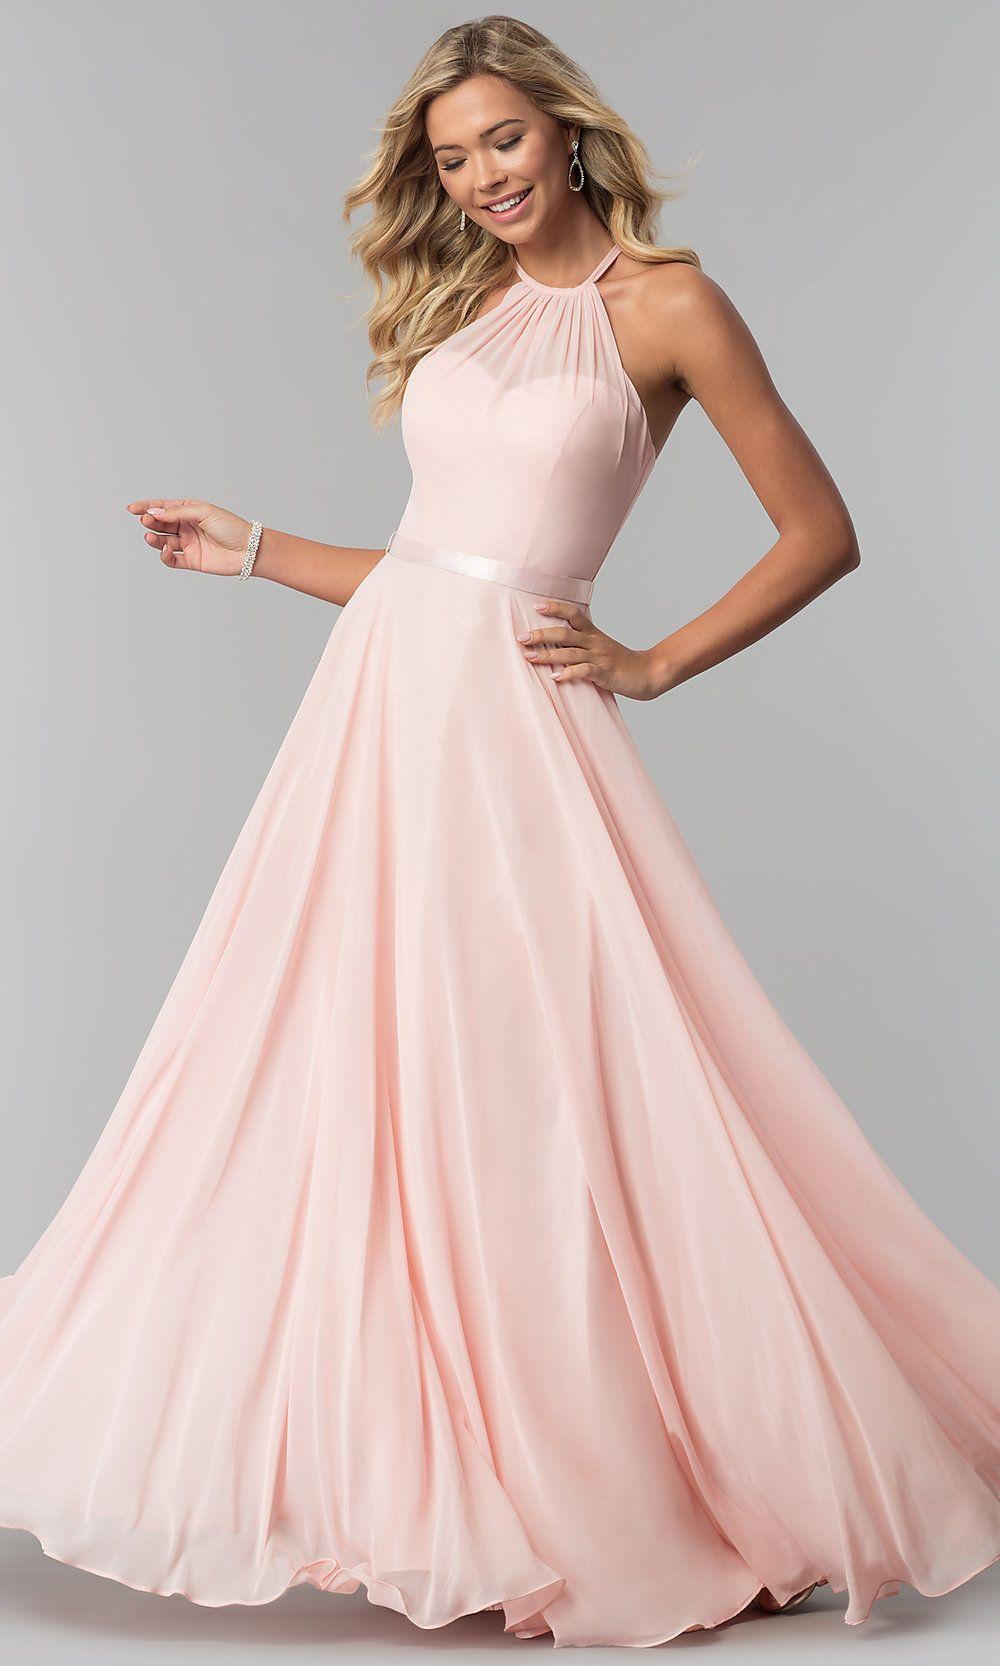 0146c62b2984 A-Line High-Neck Chiffon Formal Long Prom Dress in 2019 | Bridesmaid ...